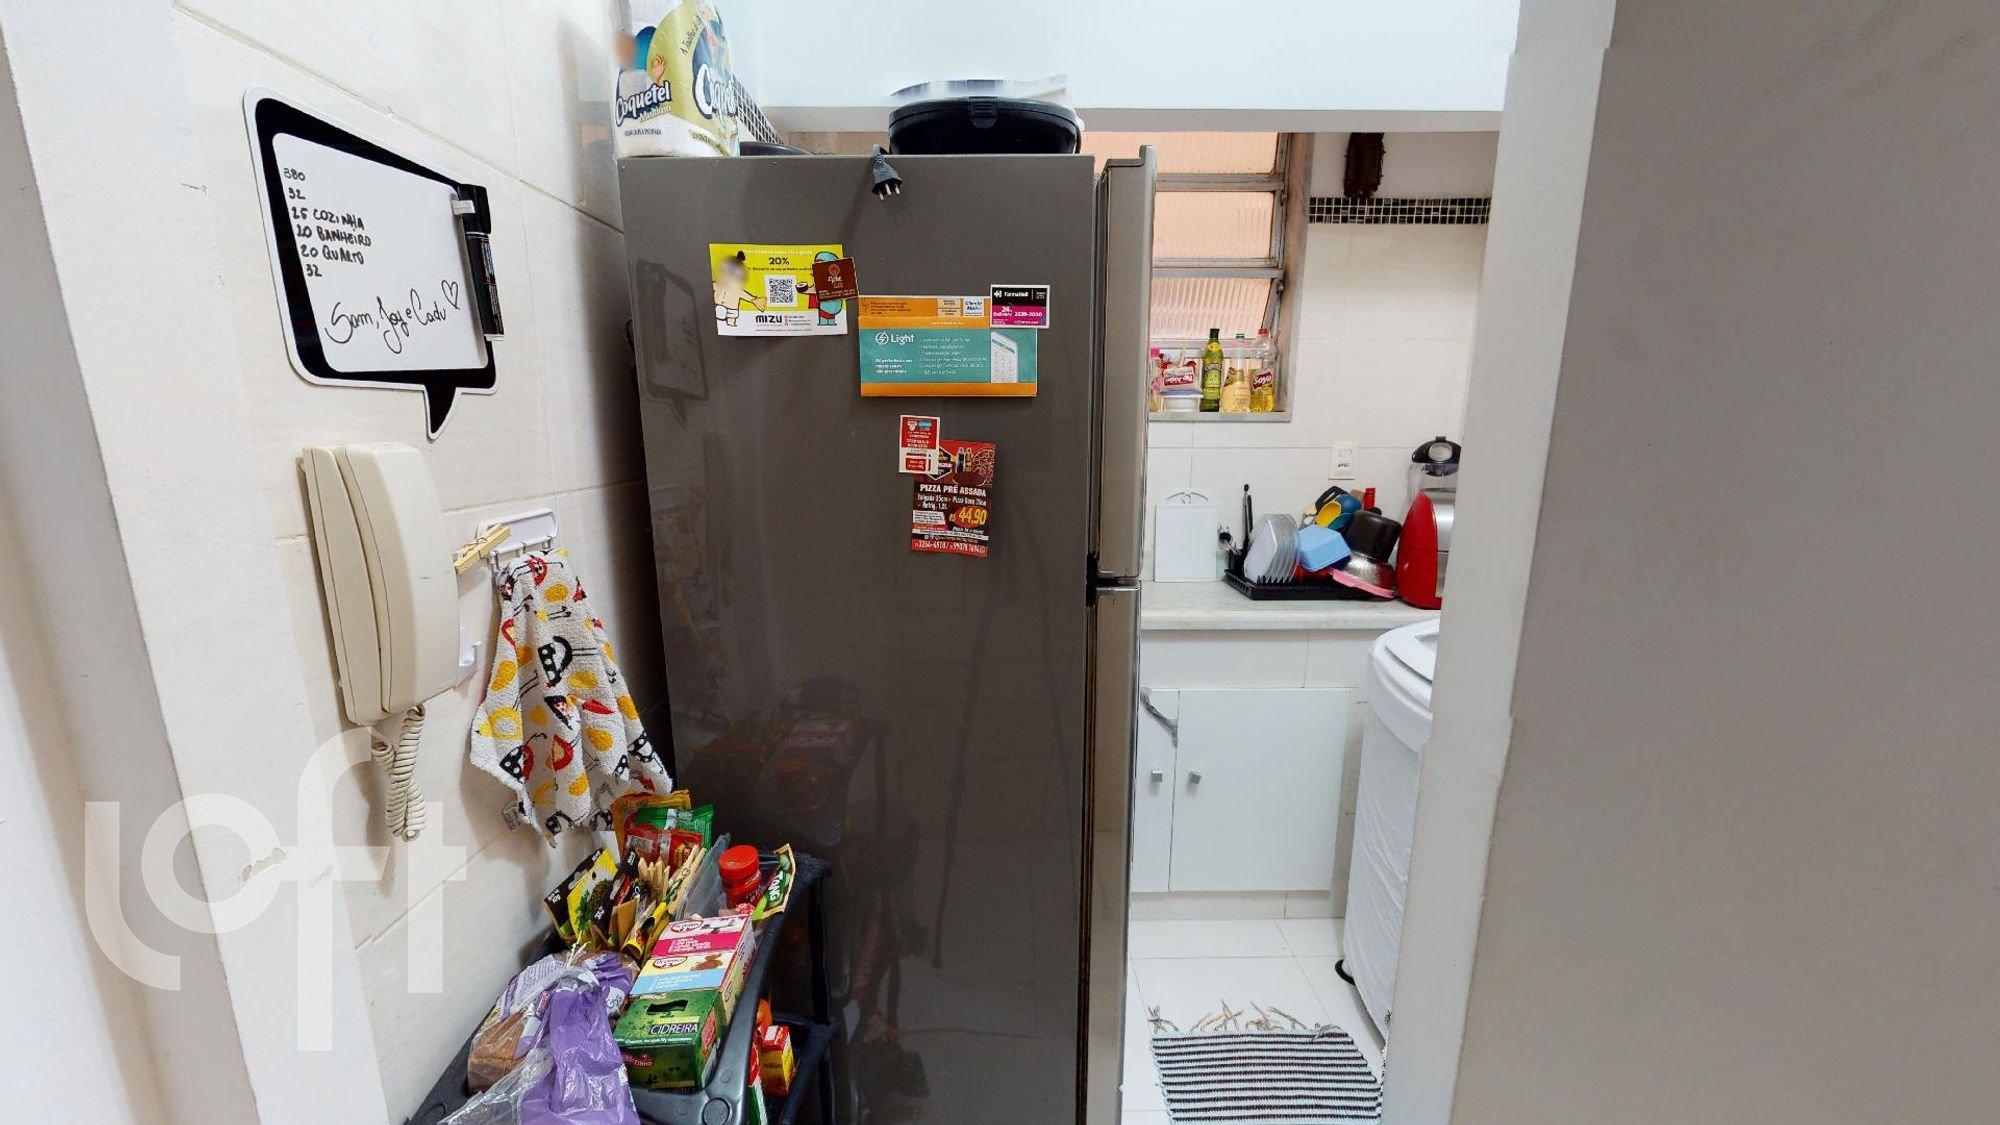 Foto de Lavanderia com geladeira, garrafa